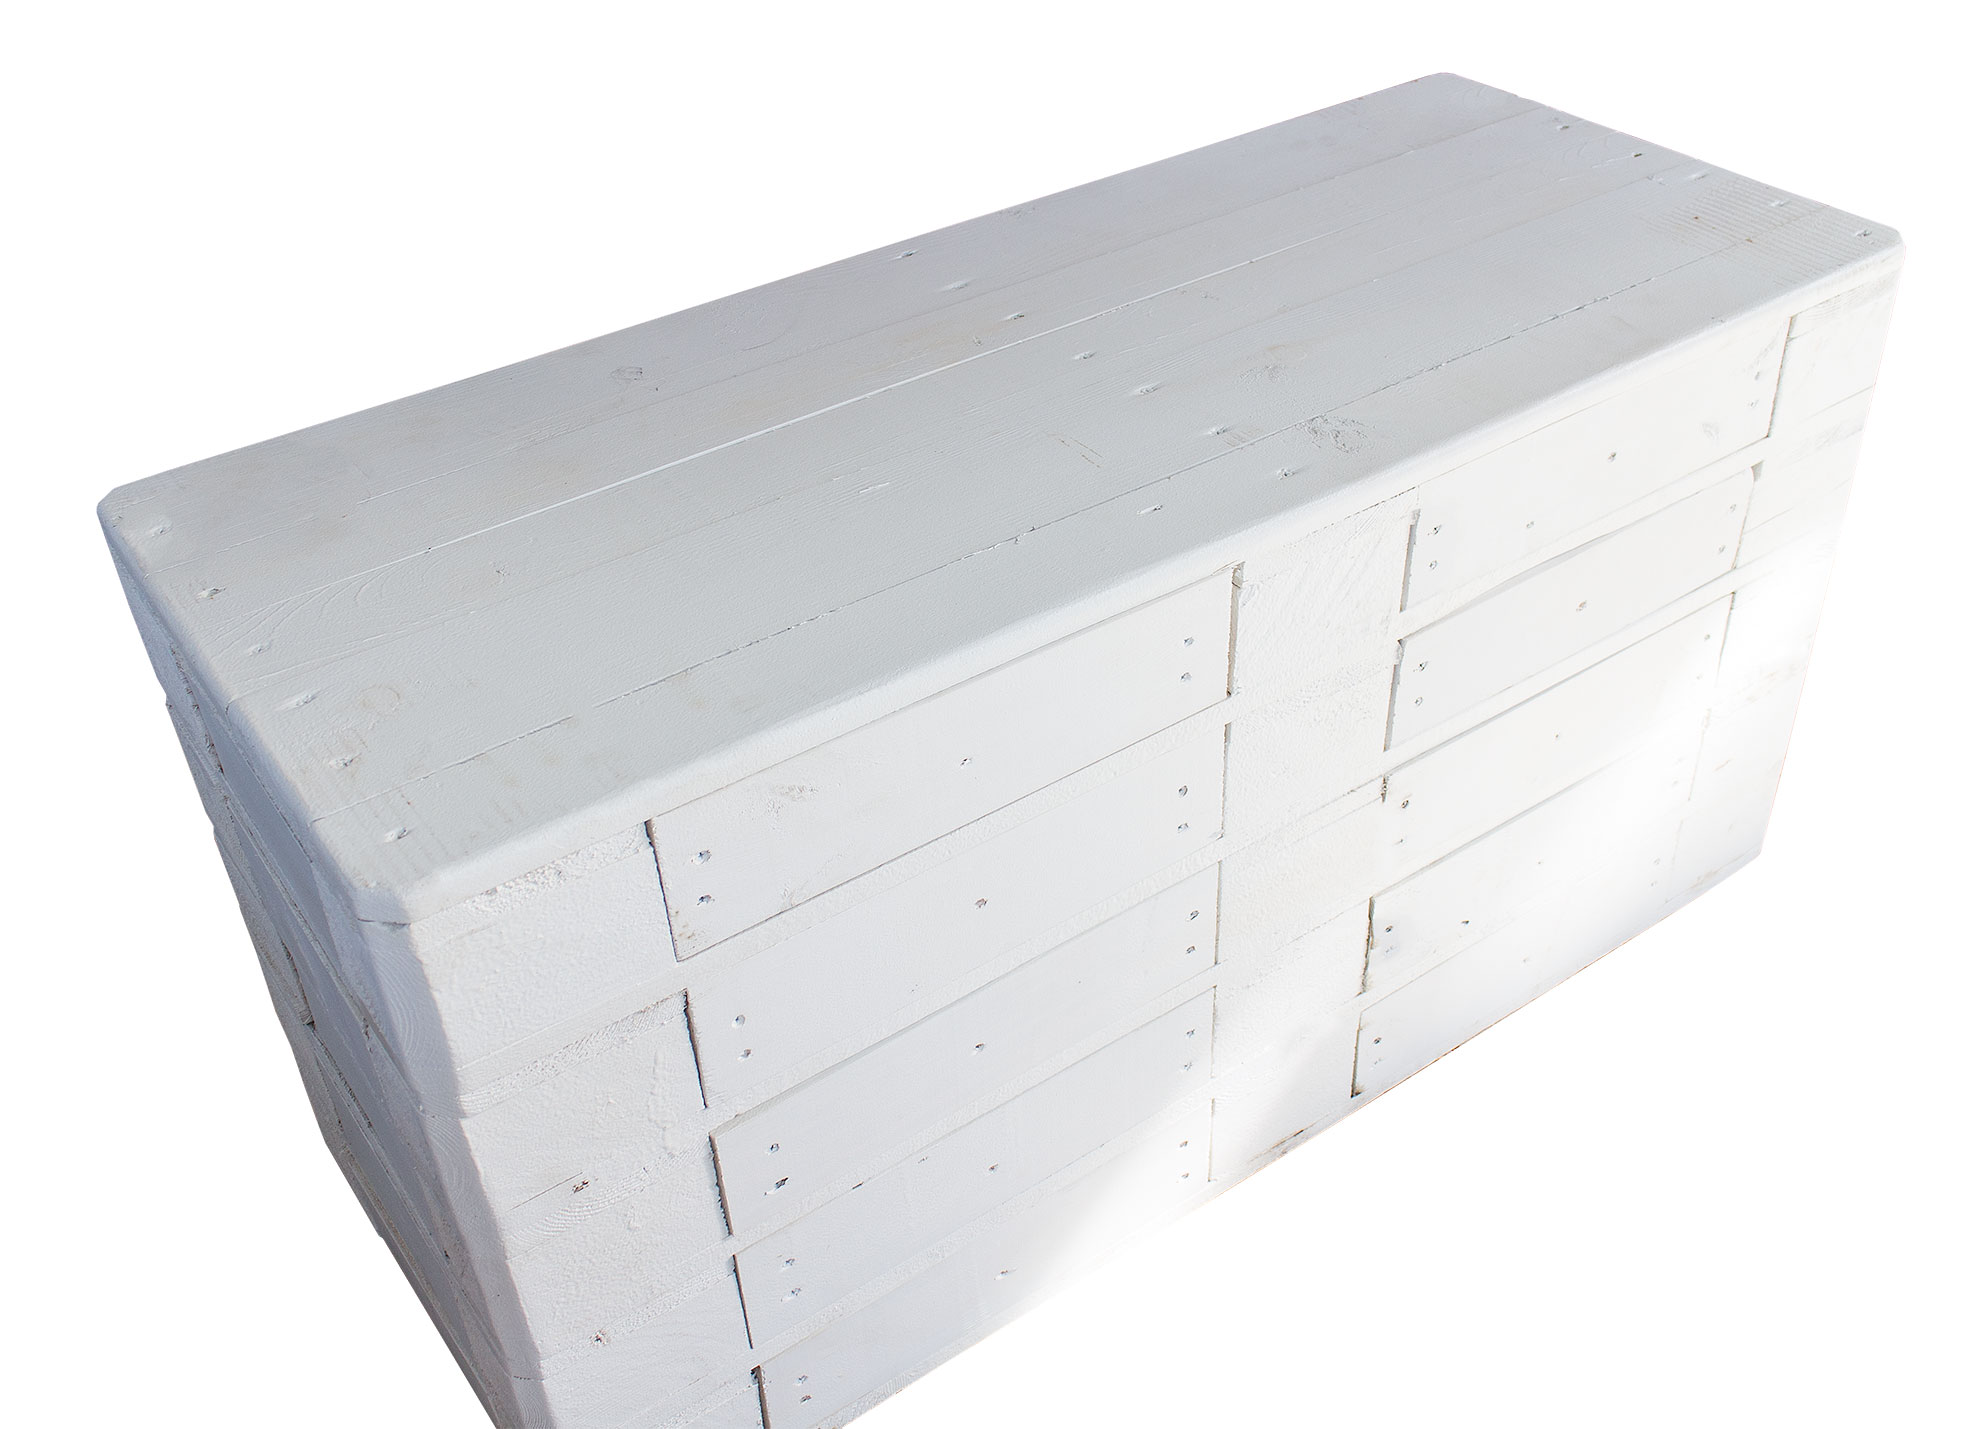 m bel vintage kommode aus palettenholz white edition 120x47x72cm. Black Bedroom Furniture Sets. Home Design Ideas